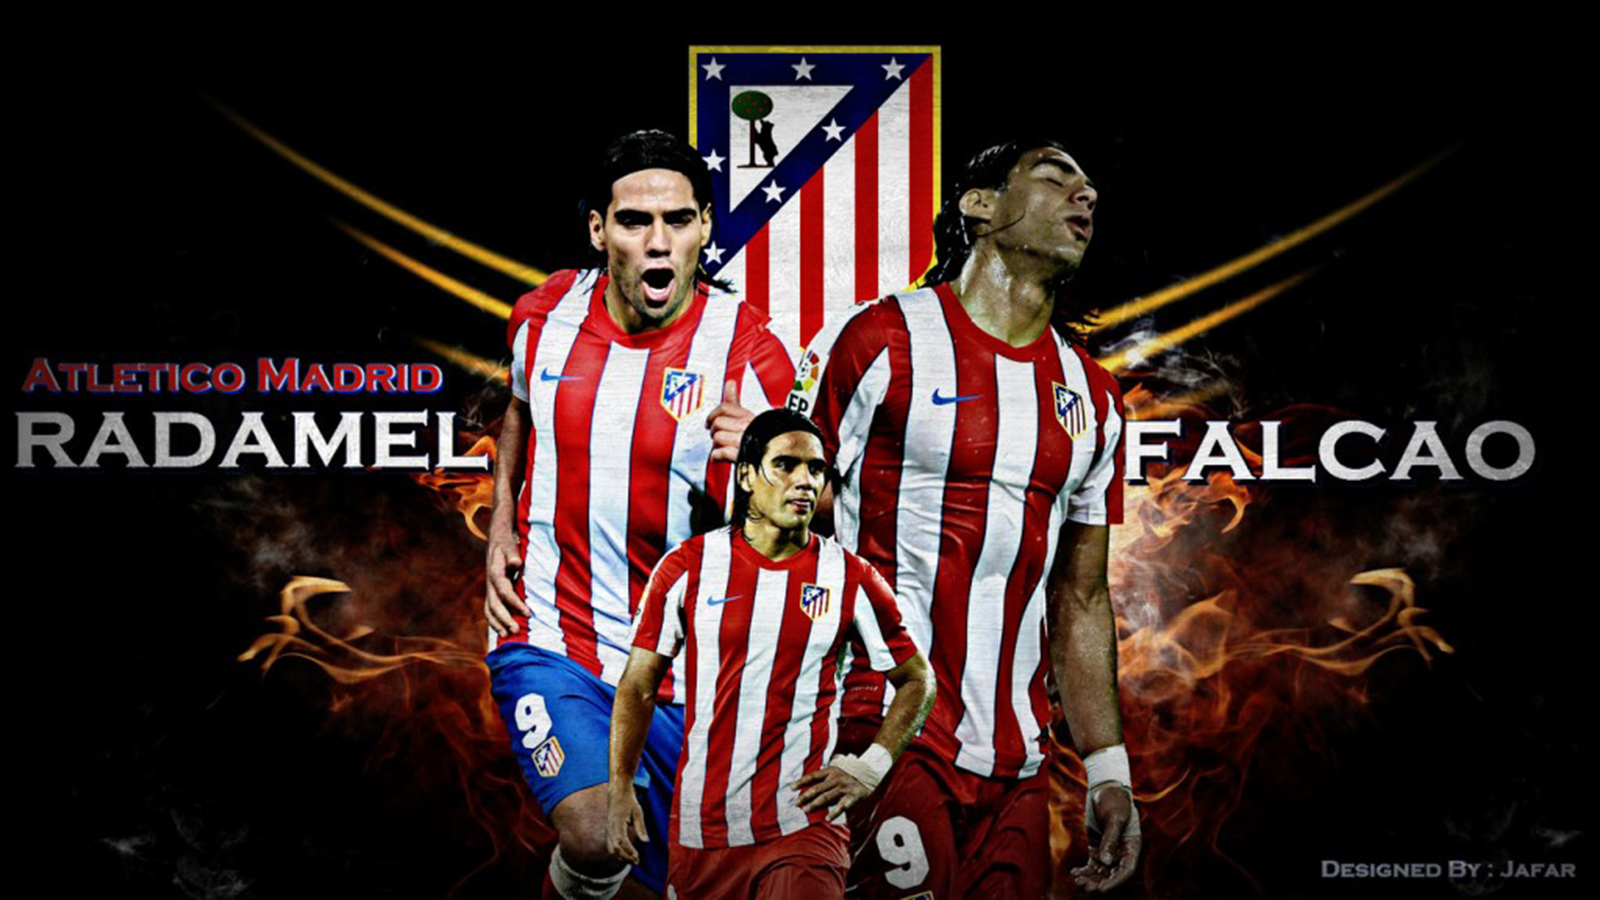 wallpaper Falcao, atletico madrid